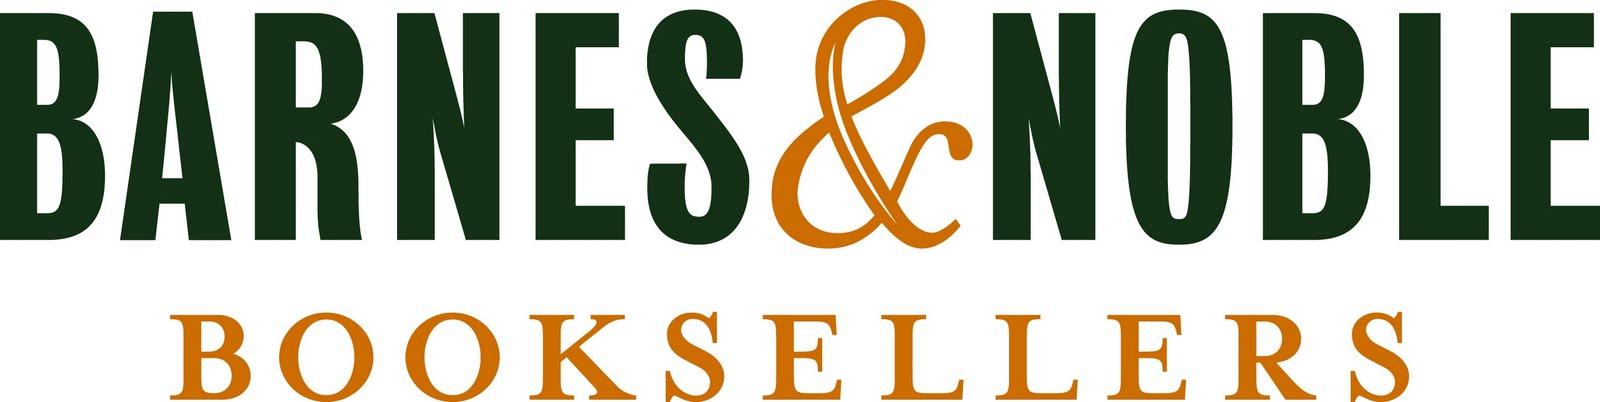 barnes and noble logo - photo #21